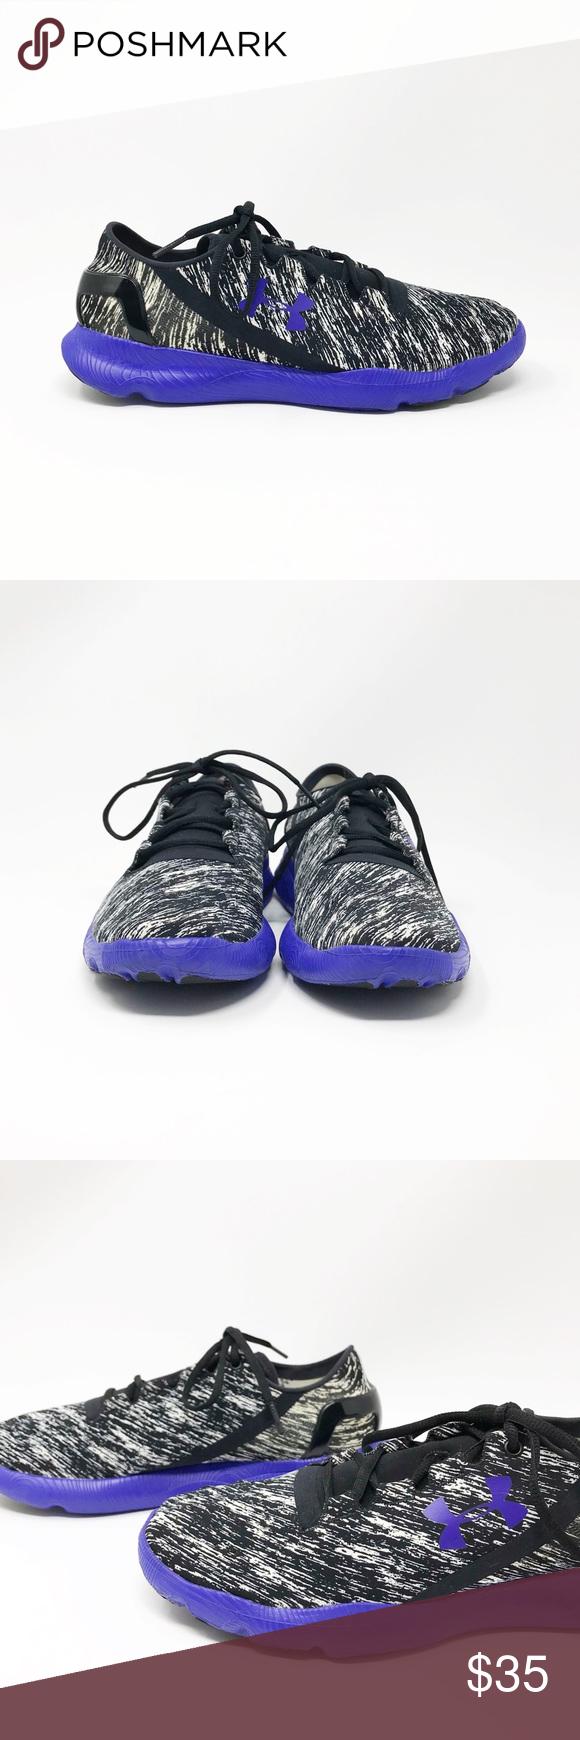 new concept 1483c 242dc Under Armour Speedform Appollo Twist Sneakers 8.5 Under ...